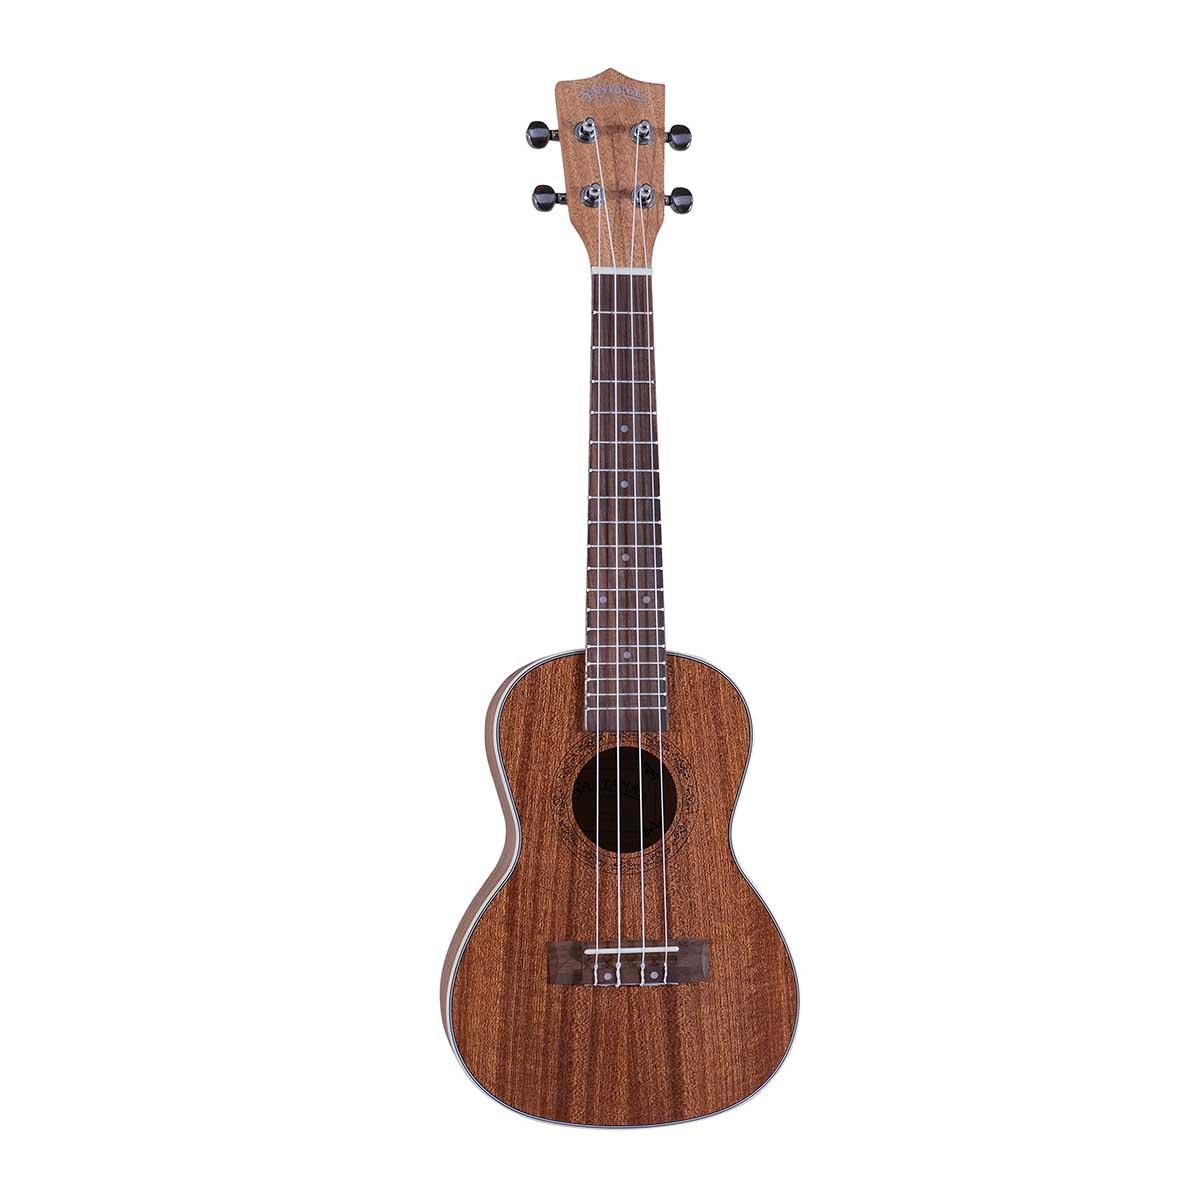 Santana 35C concert-ukulele